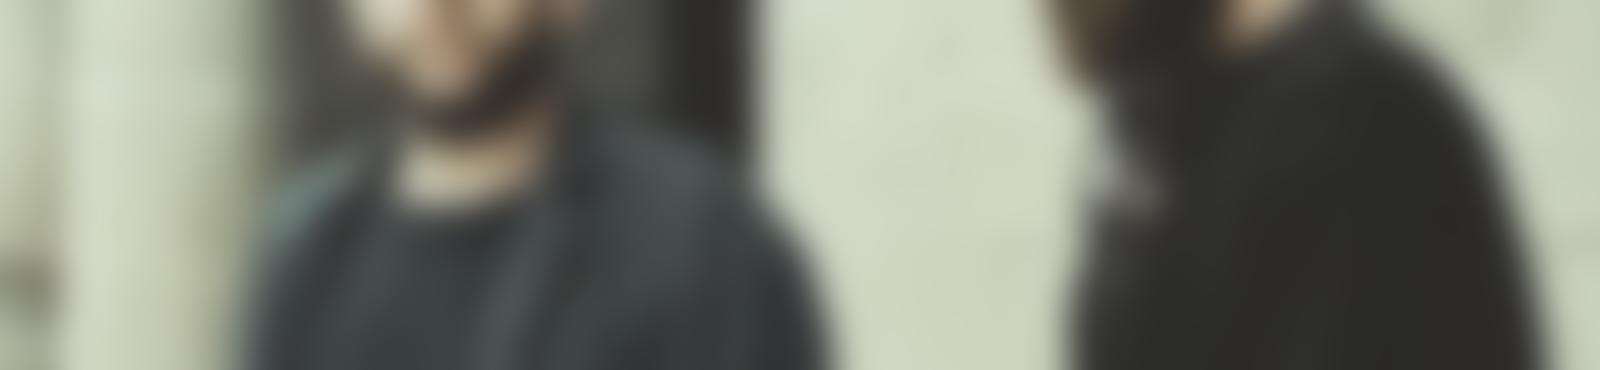 Blurred 64d12788 5e64 4fac b796 170592a20187